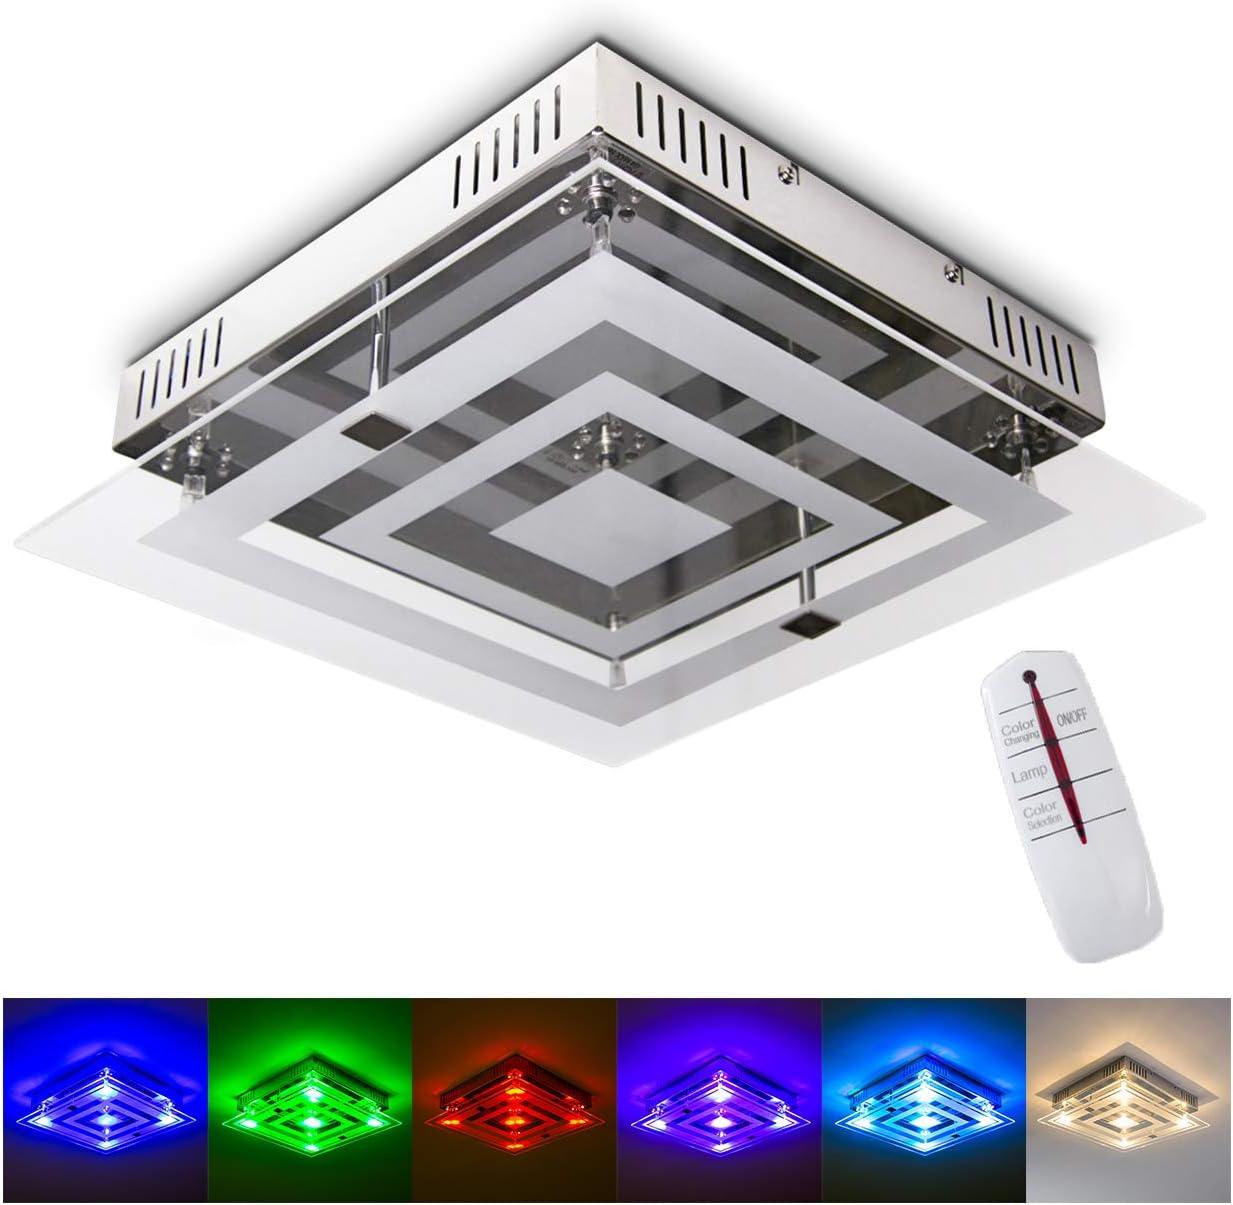 DIMMBAR RGB LED Farbwechsel Leuchte Design Effekt Kinder